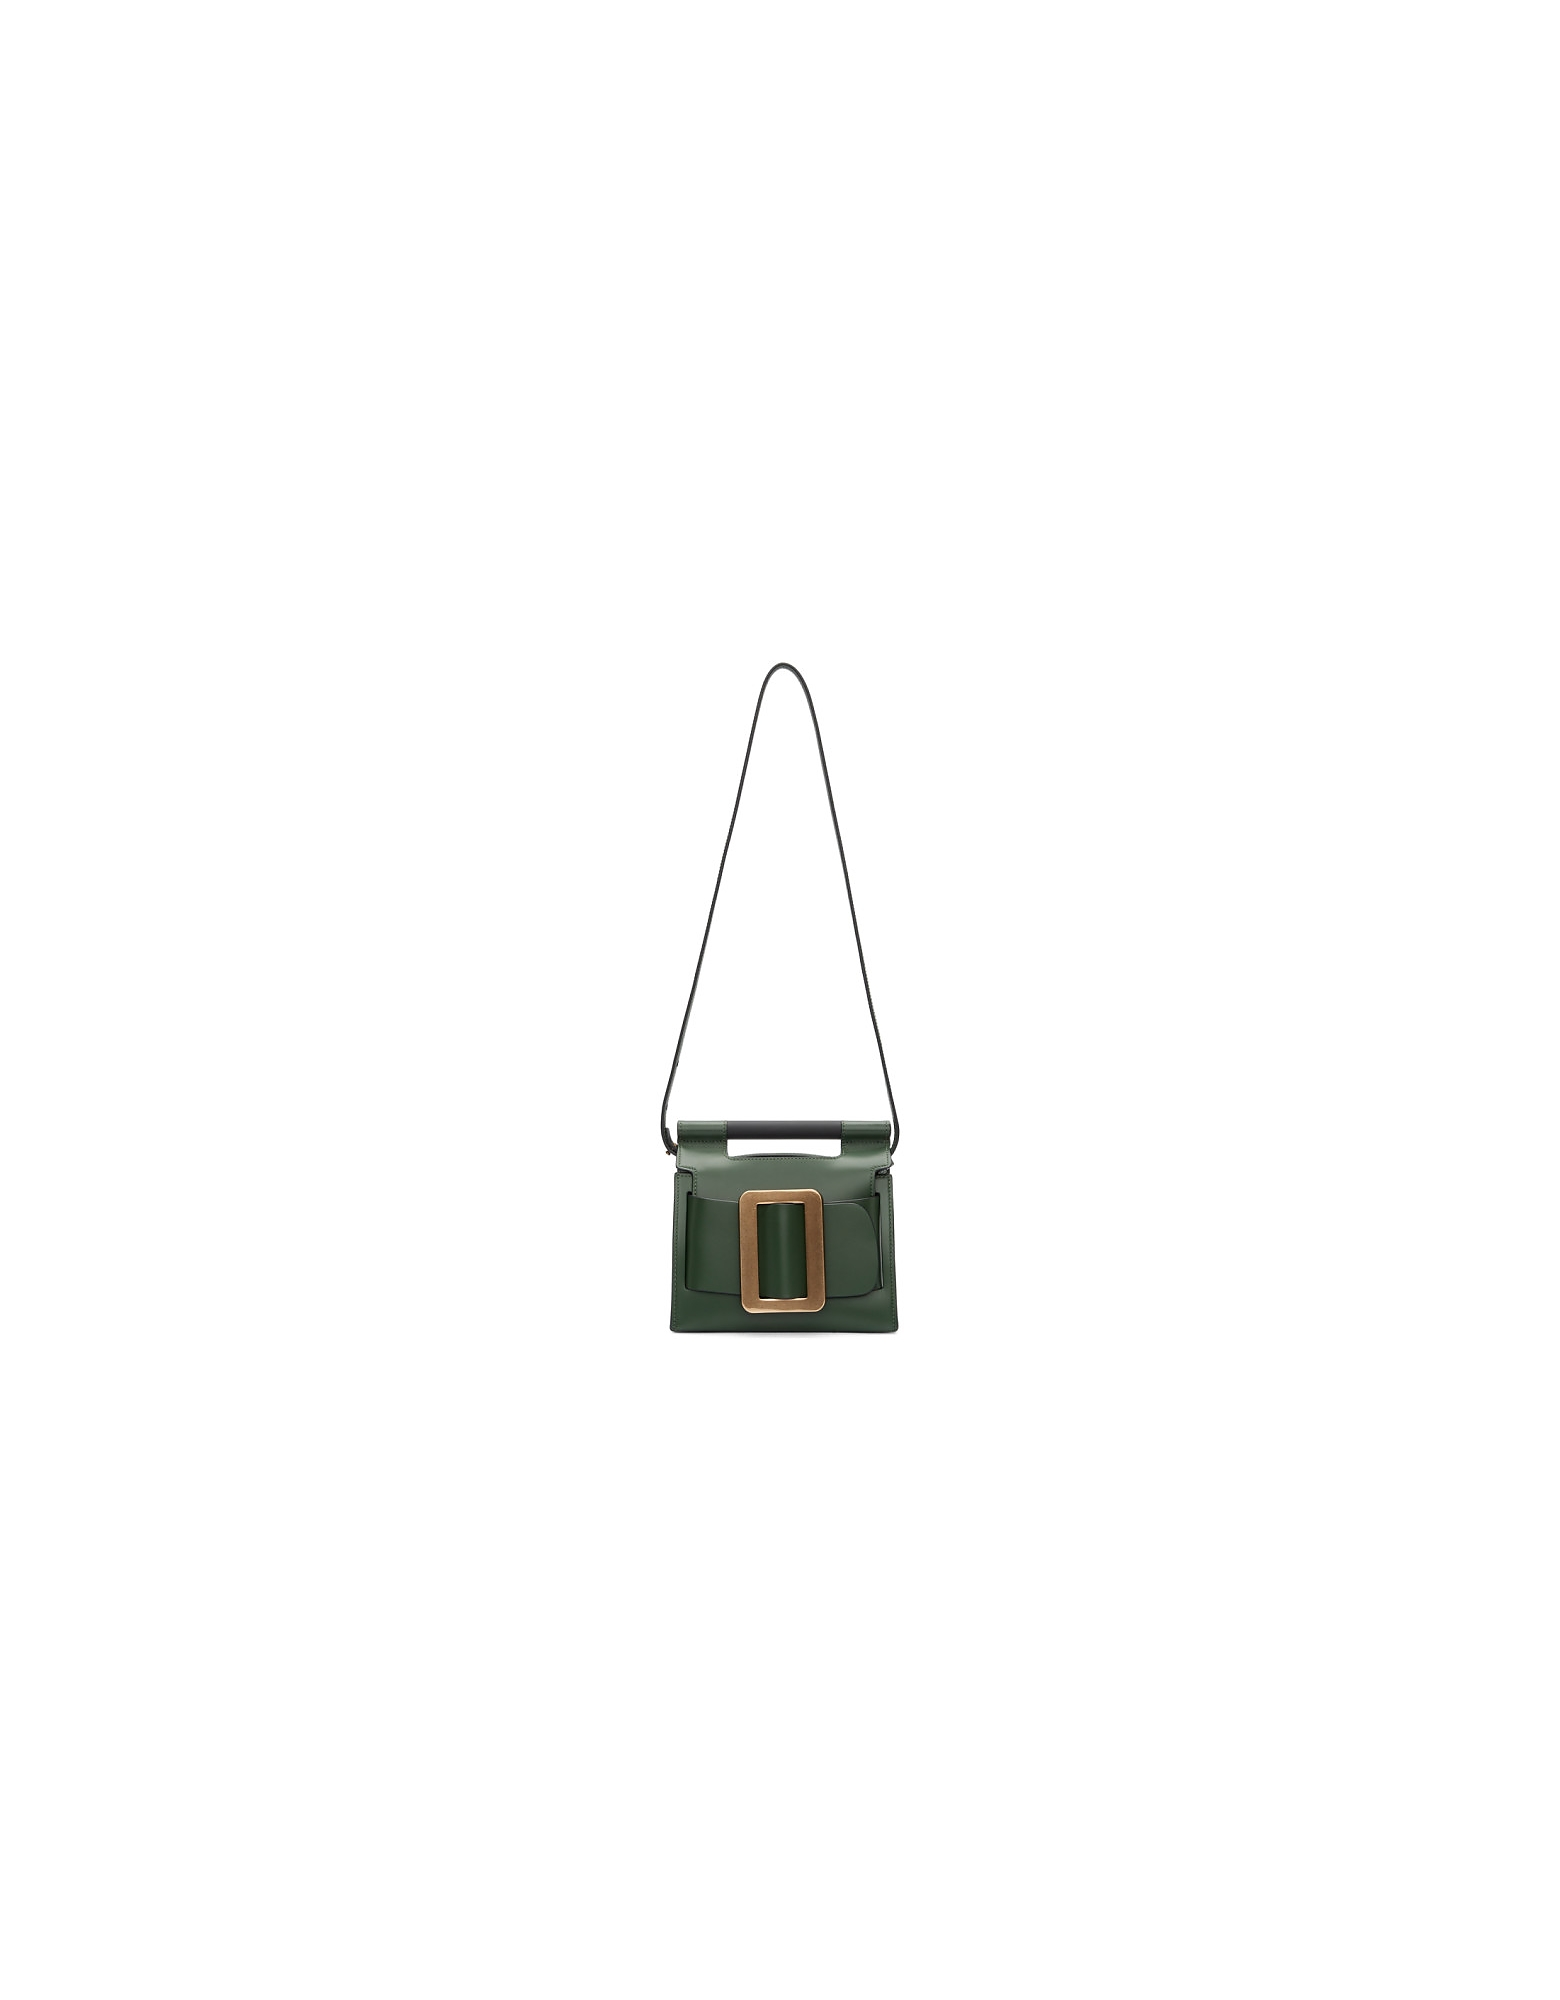 BOYY Designer Handbags, Green Romeo Bag